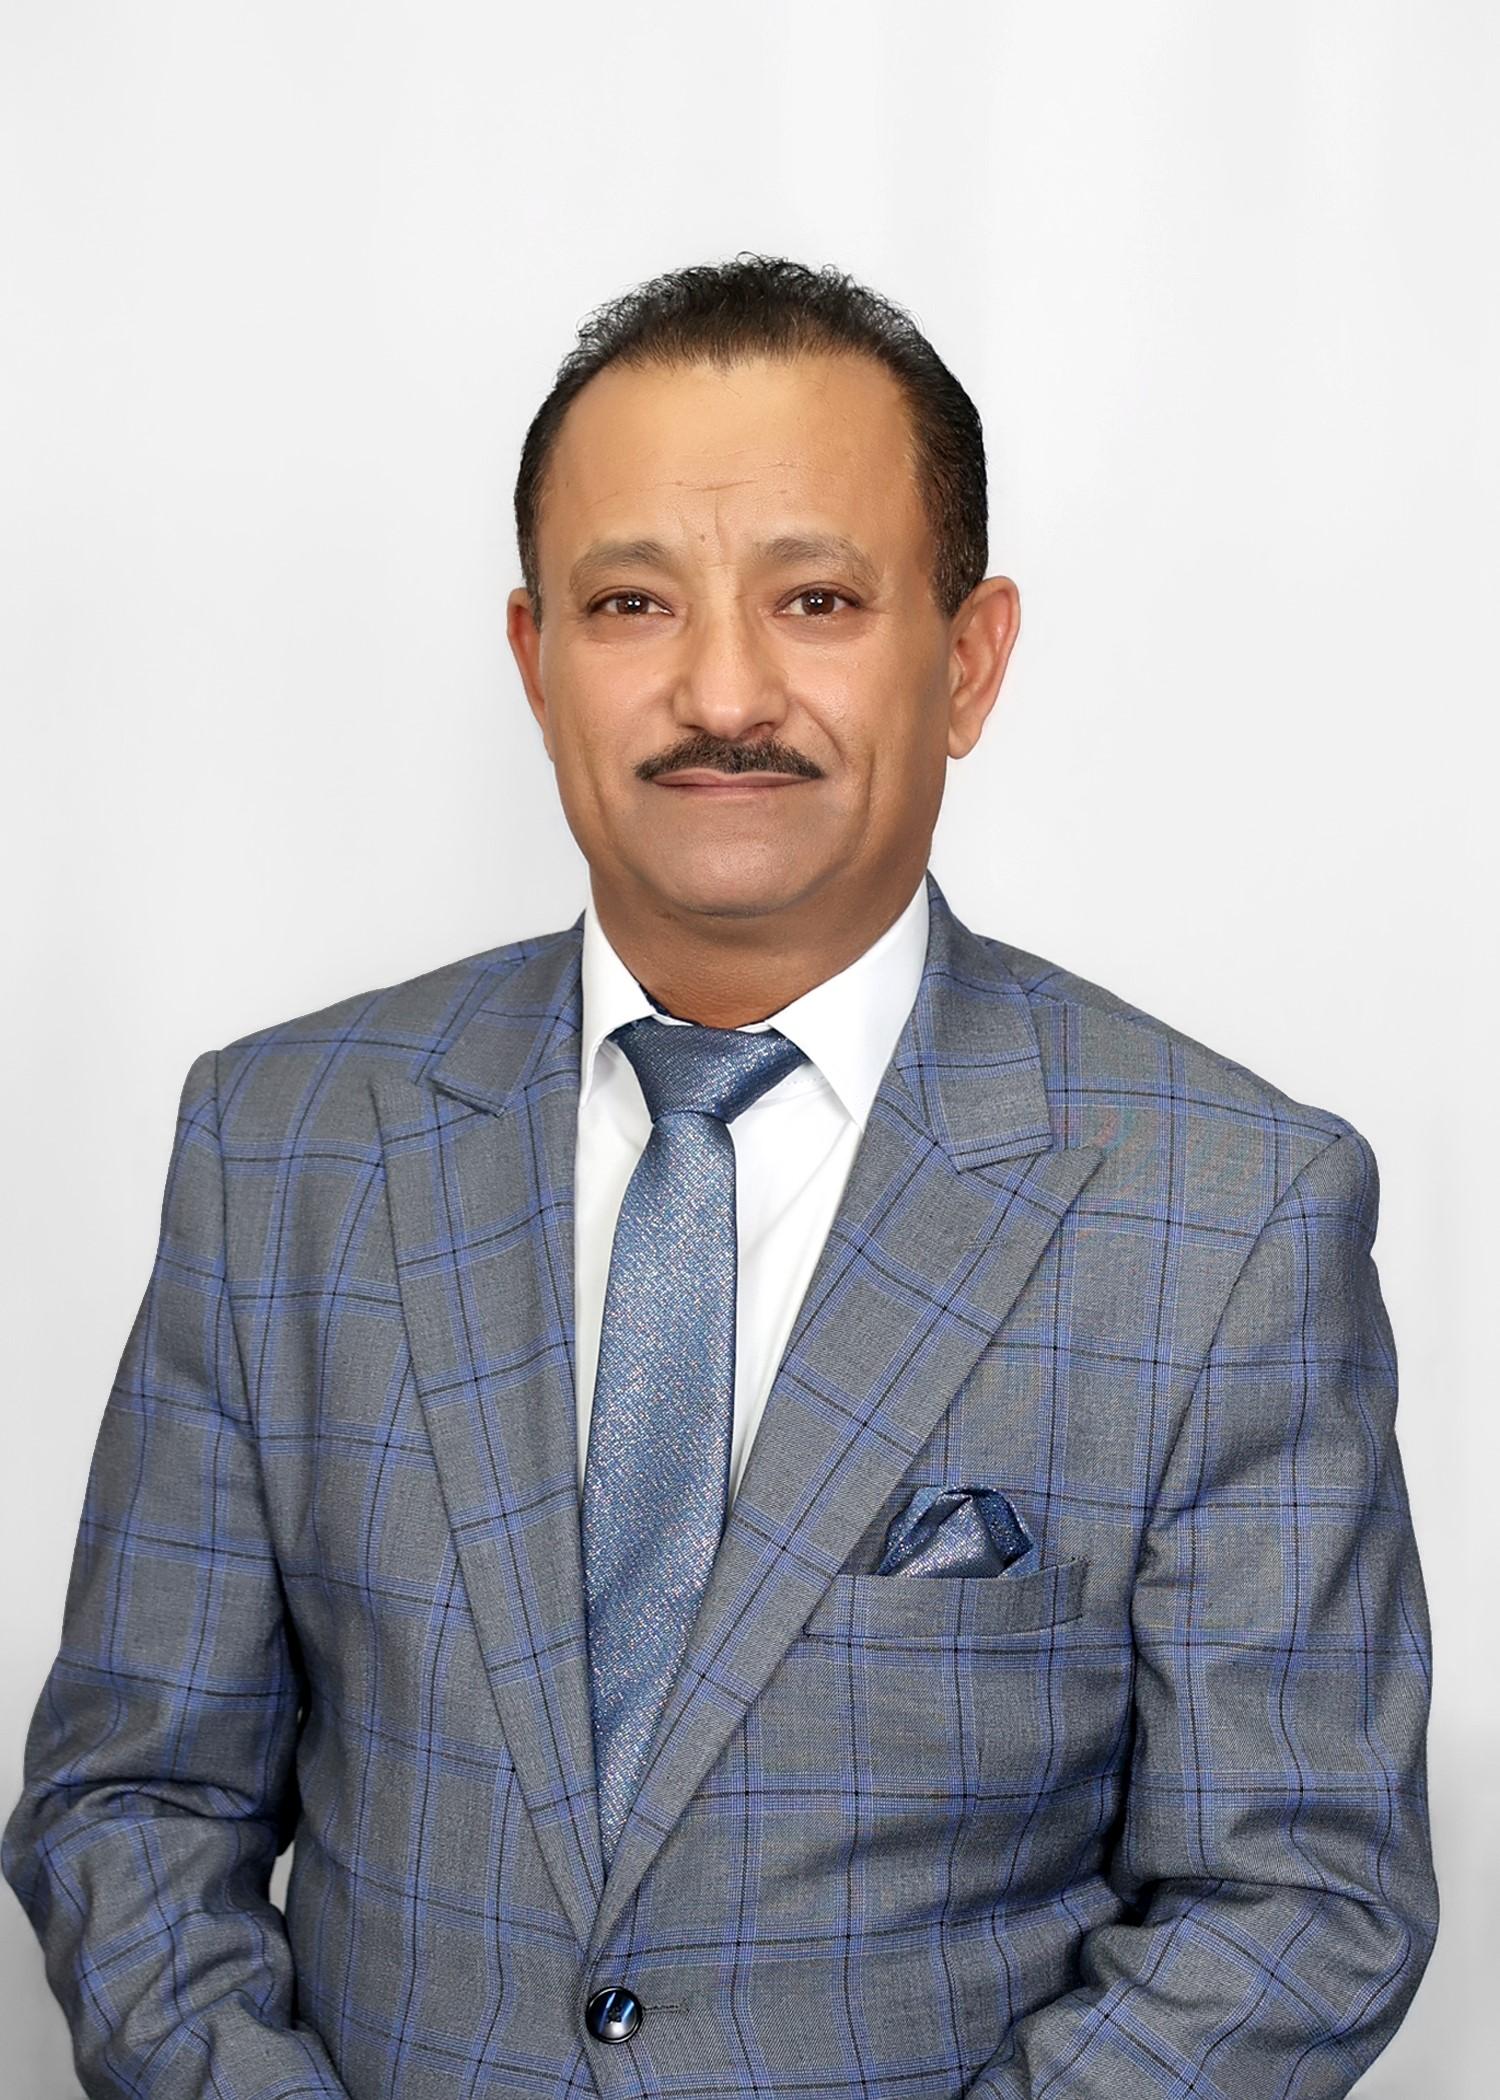 Ali Shariff